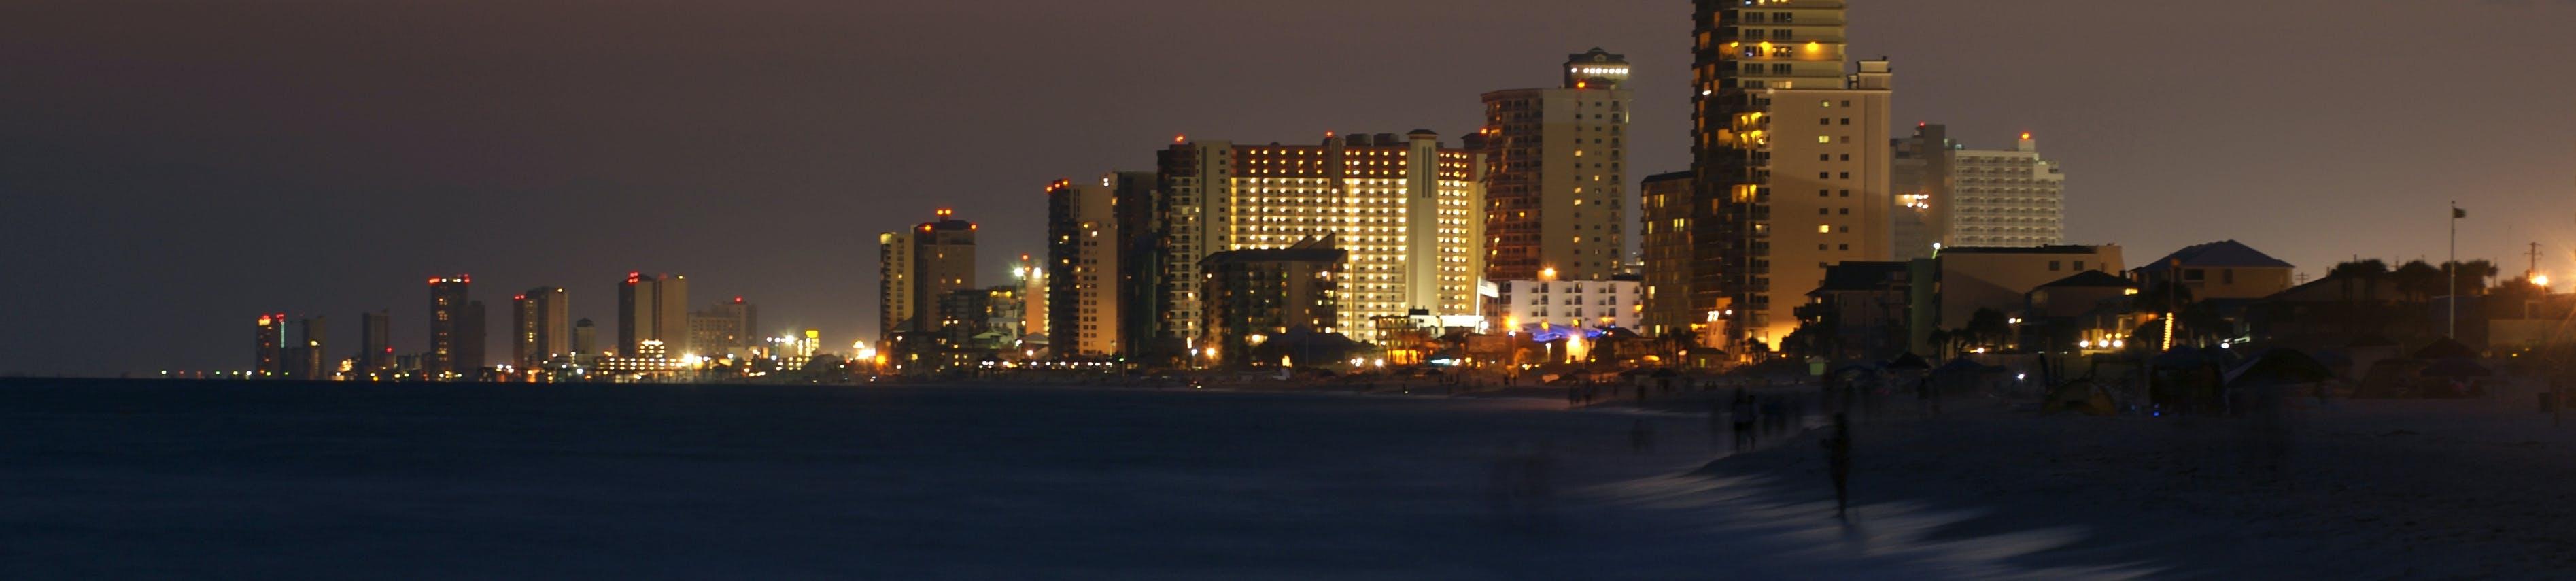 Last Minute Hotel Deals in Pensacola - HotelTonight